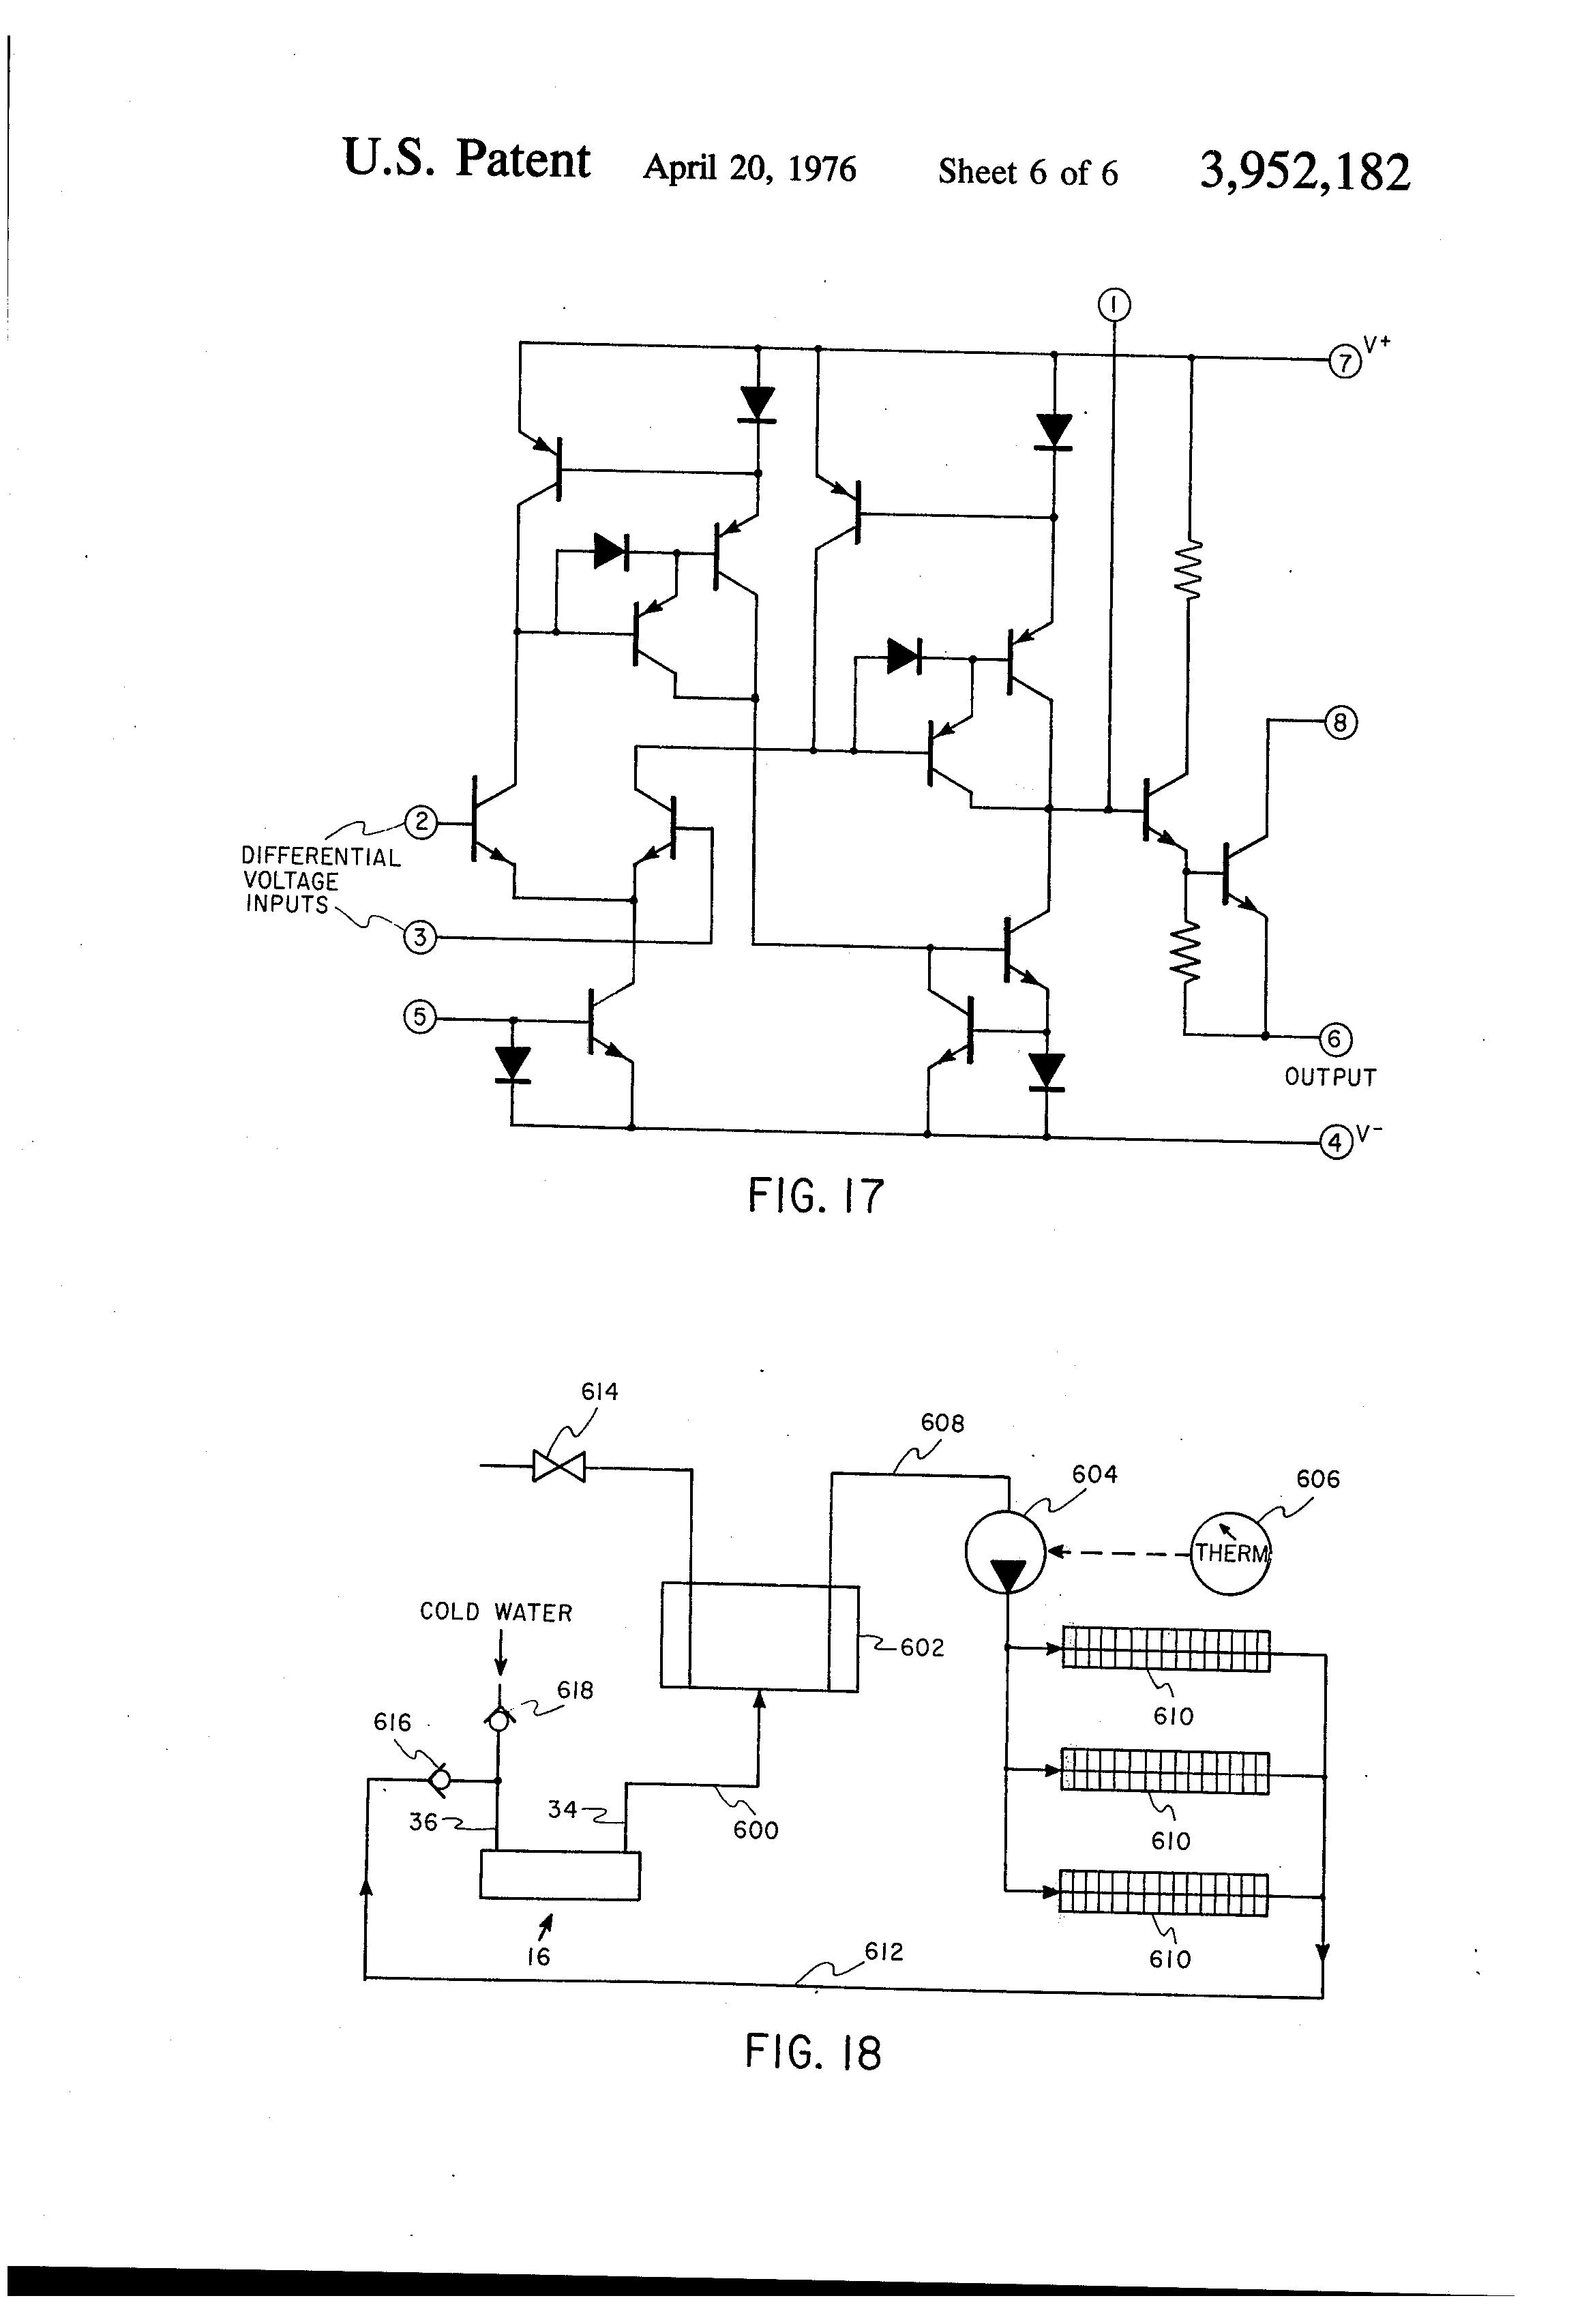 Hatco Booster Heater Wiring Diagram -Ac Fuel Filter | Begeboy Wiring Diagram  SourceBege Wiring Diagram - Begeboy Wiring Diagram Source